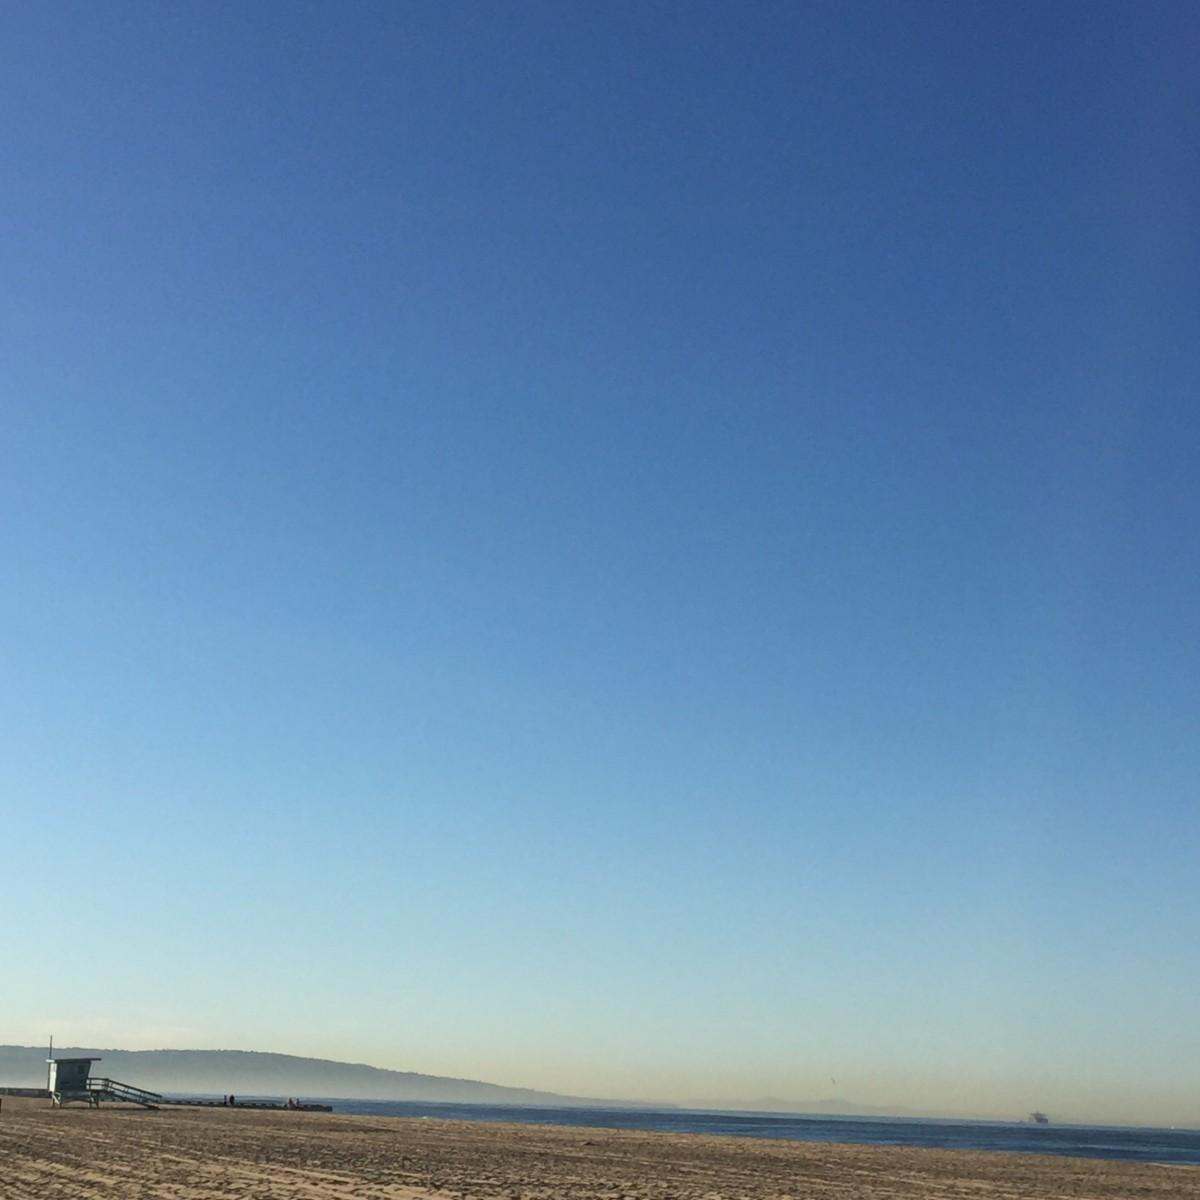 {Deserted beach}